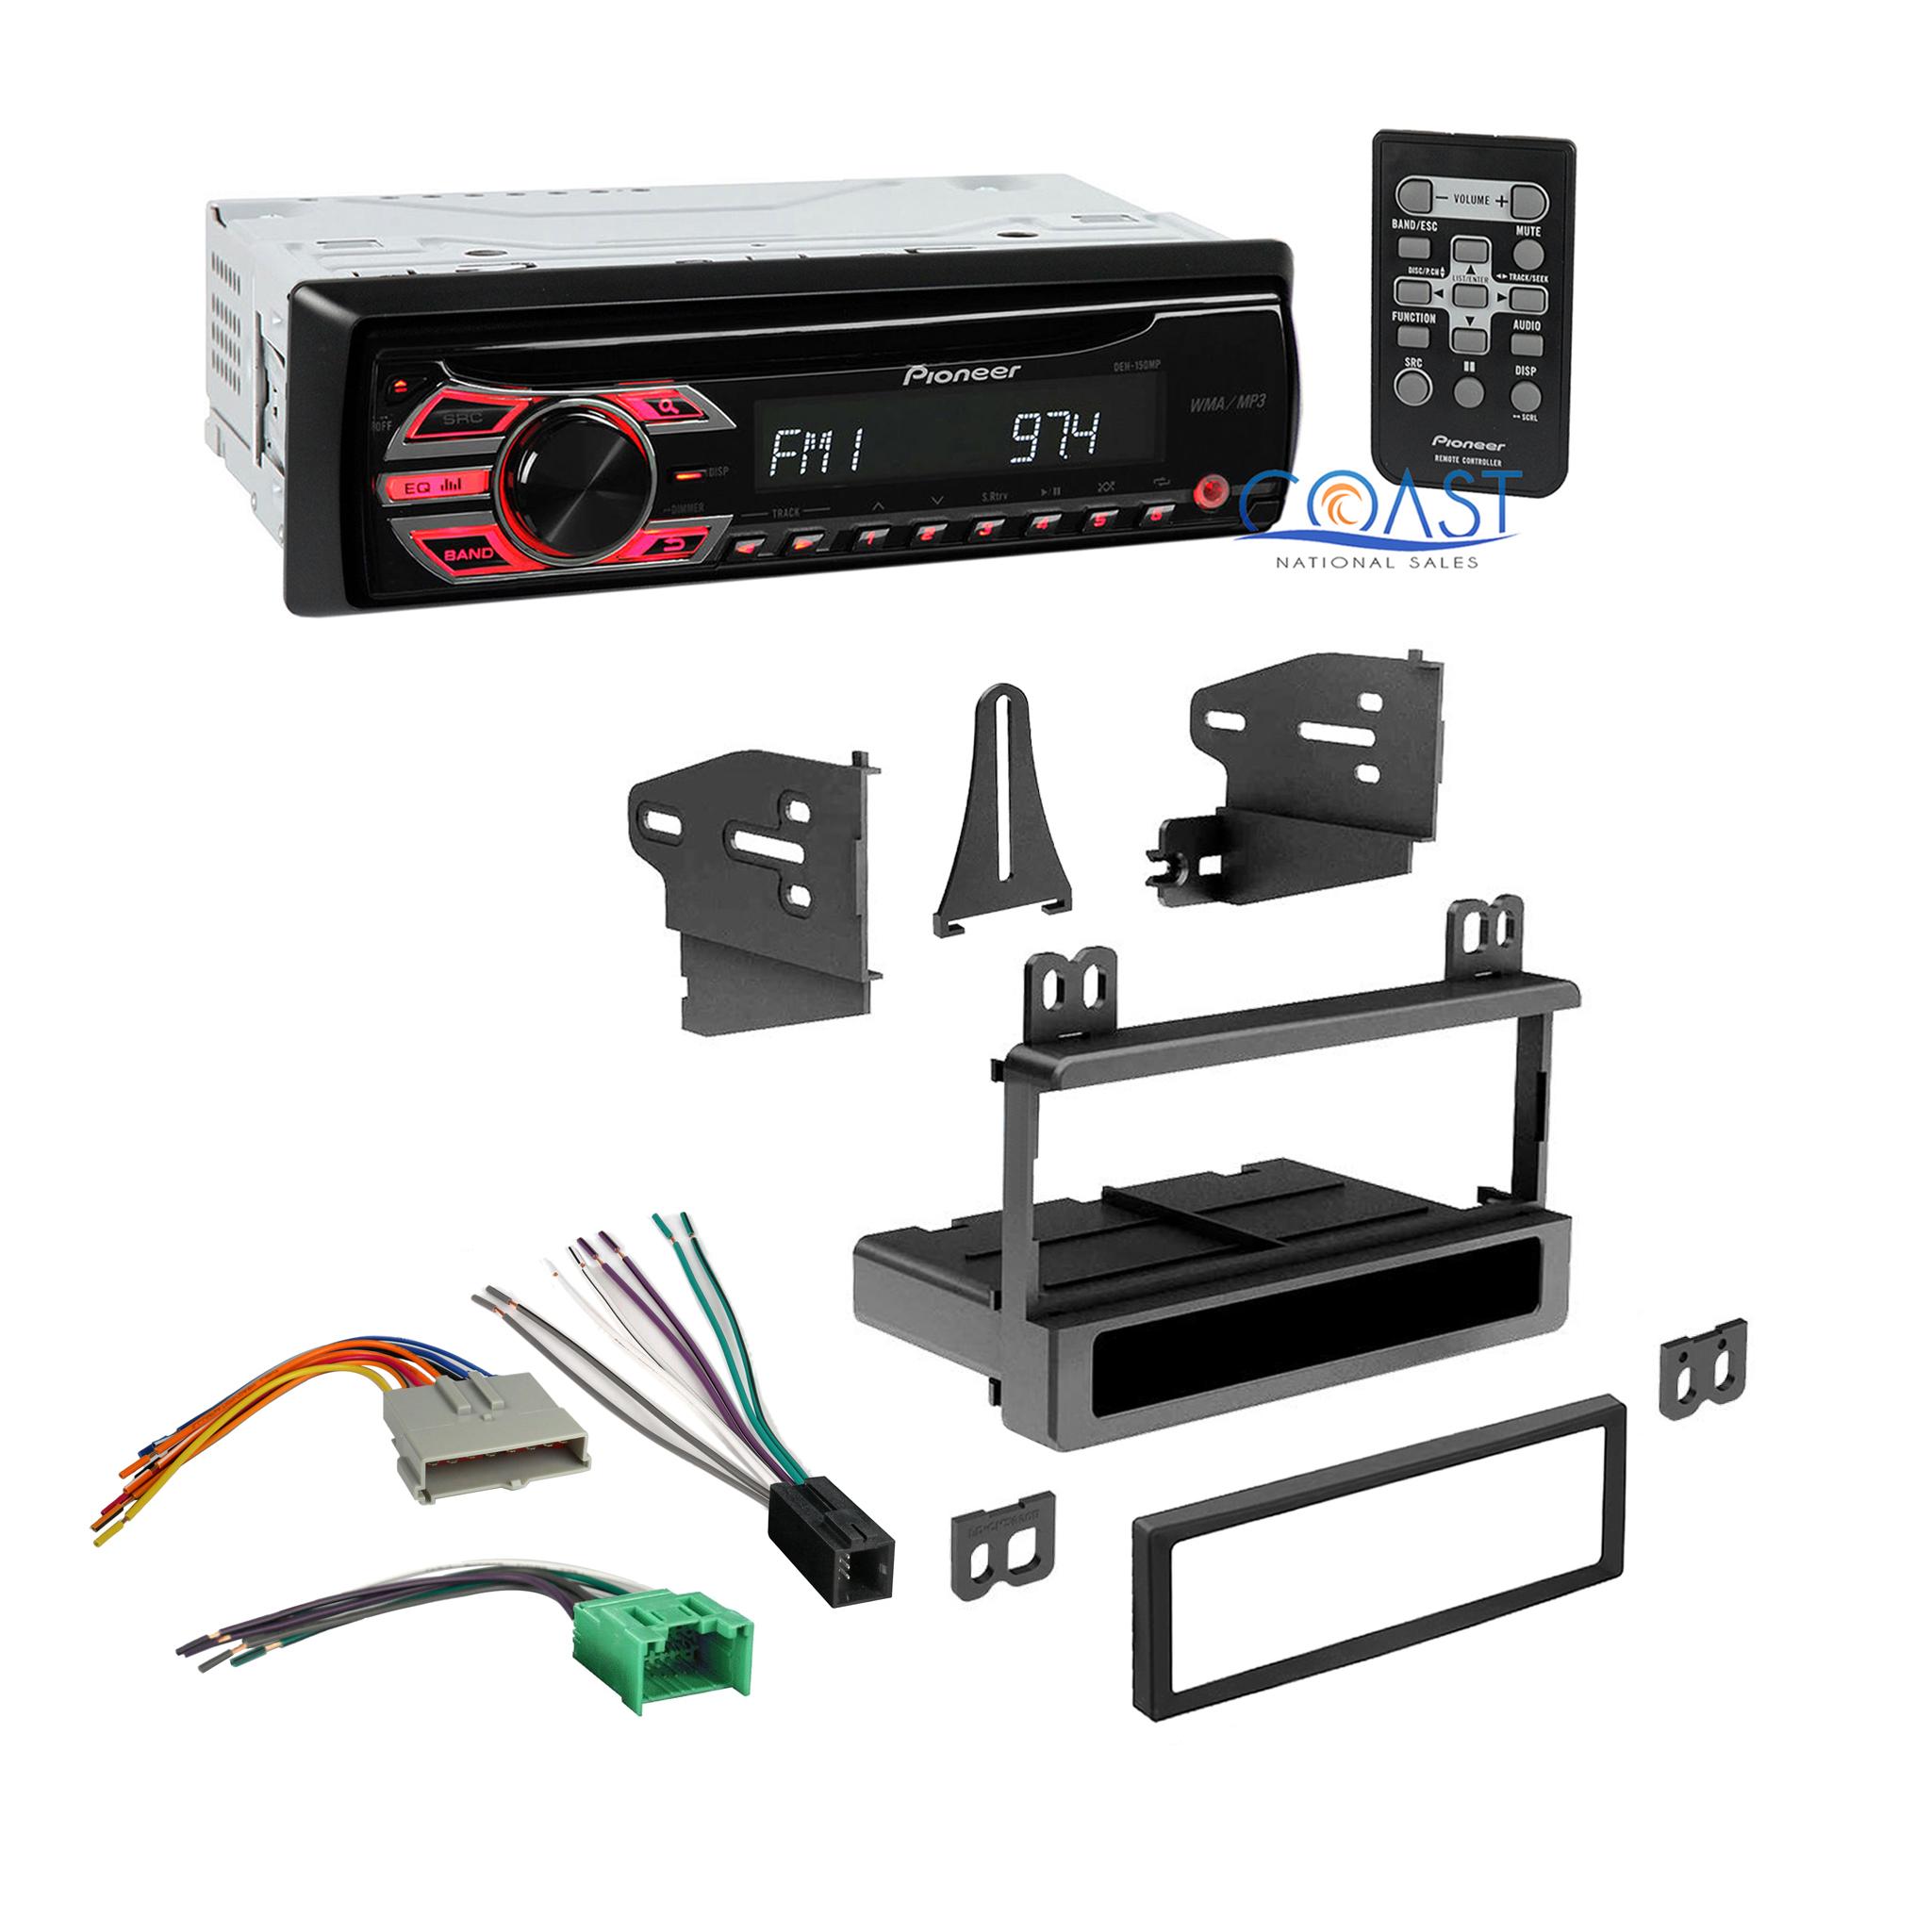 pioneer car radio stereo dash kit wire harness for ford lincoln mercury mazda ebay